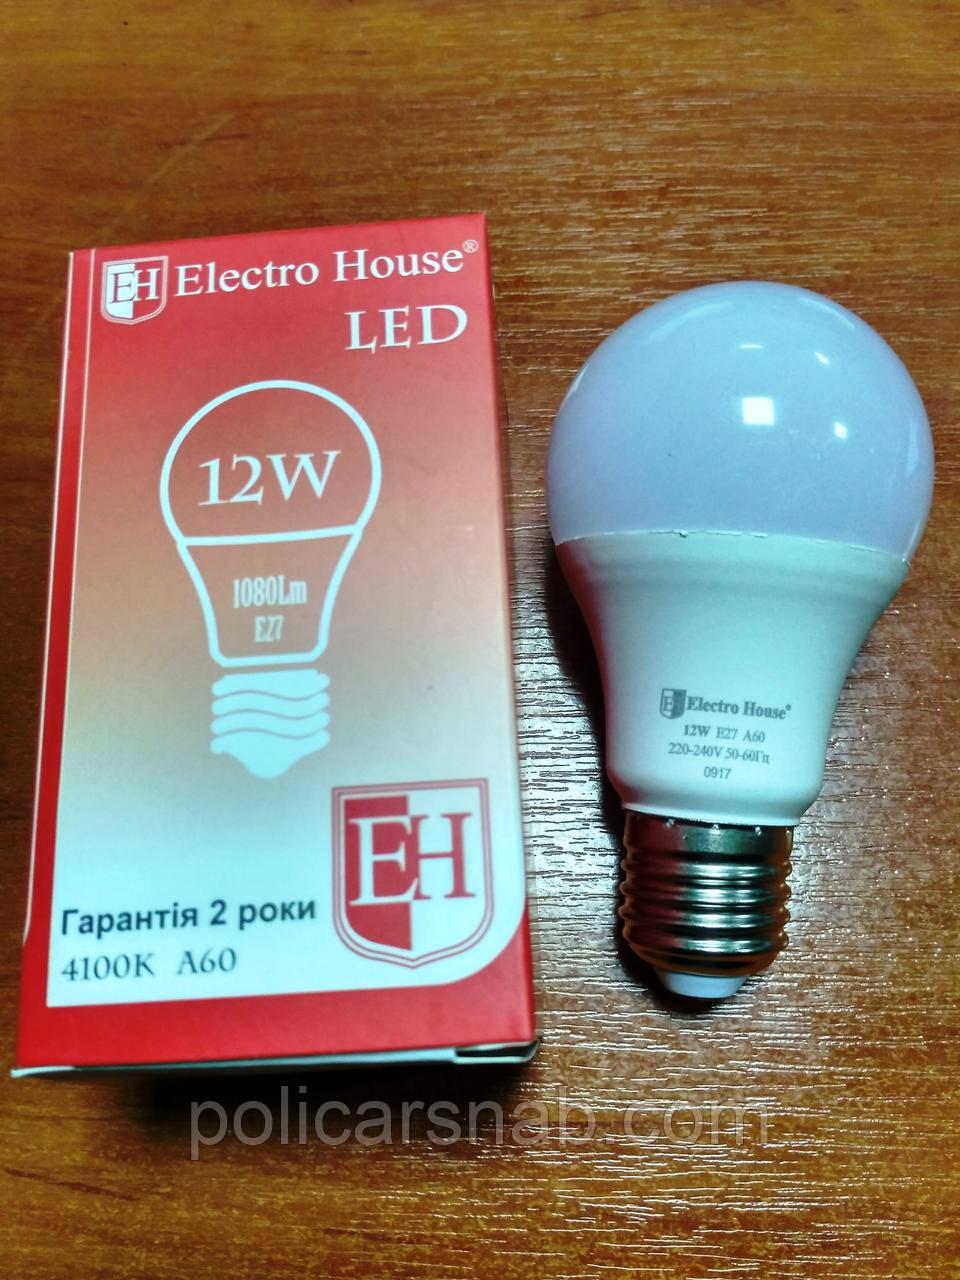 Лампа Electro House светодиодная 12W 1080Lm Е27 шар